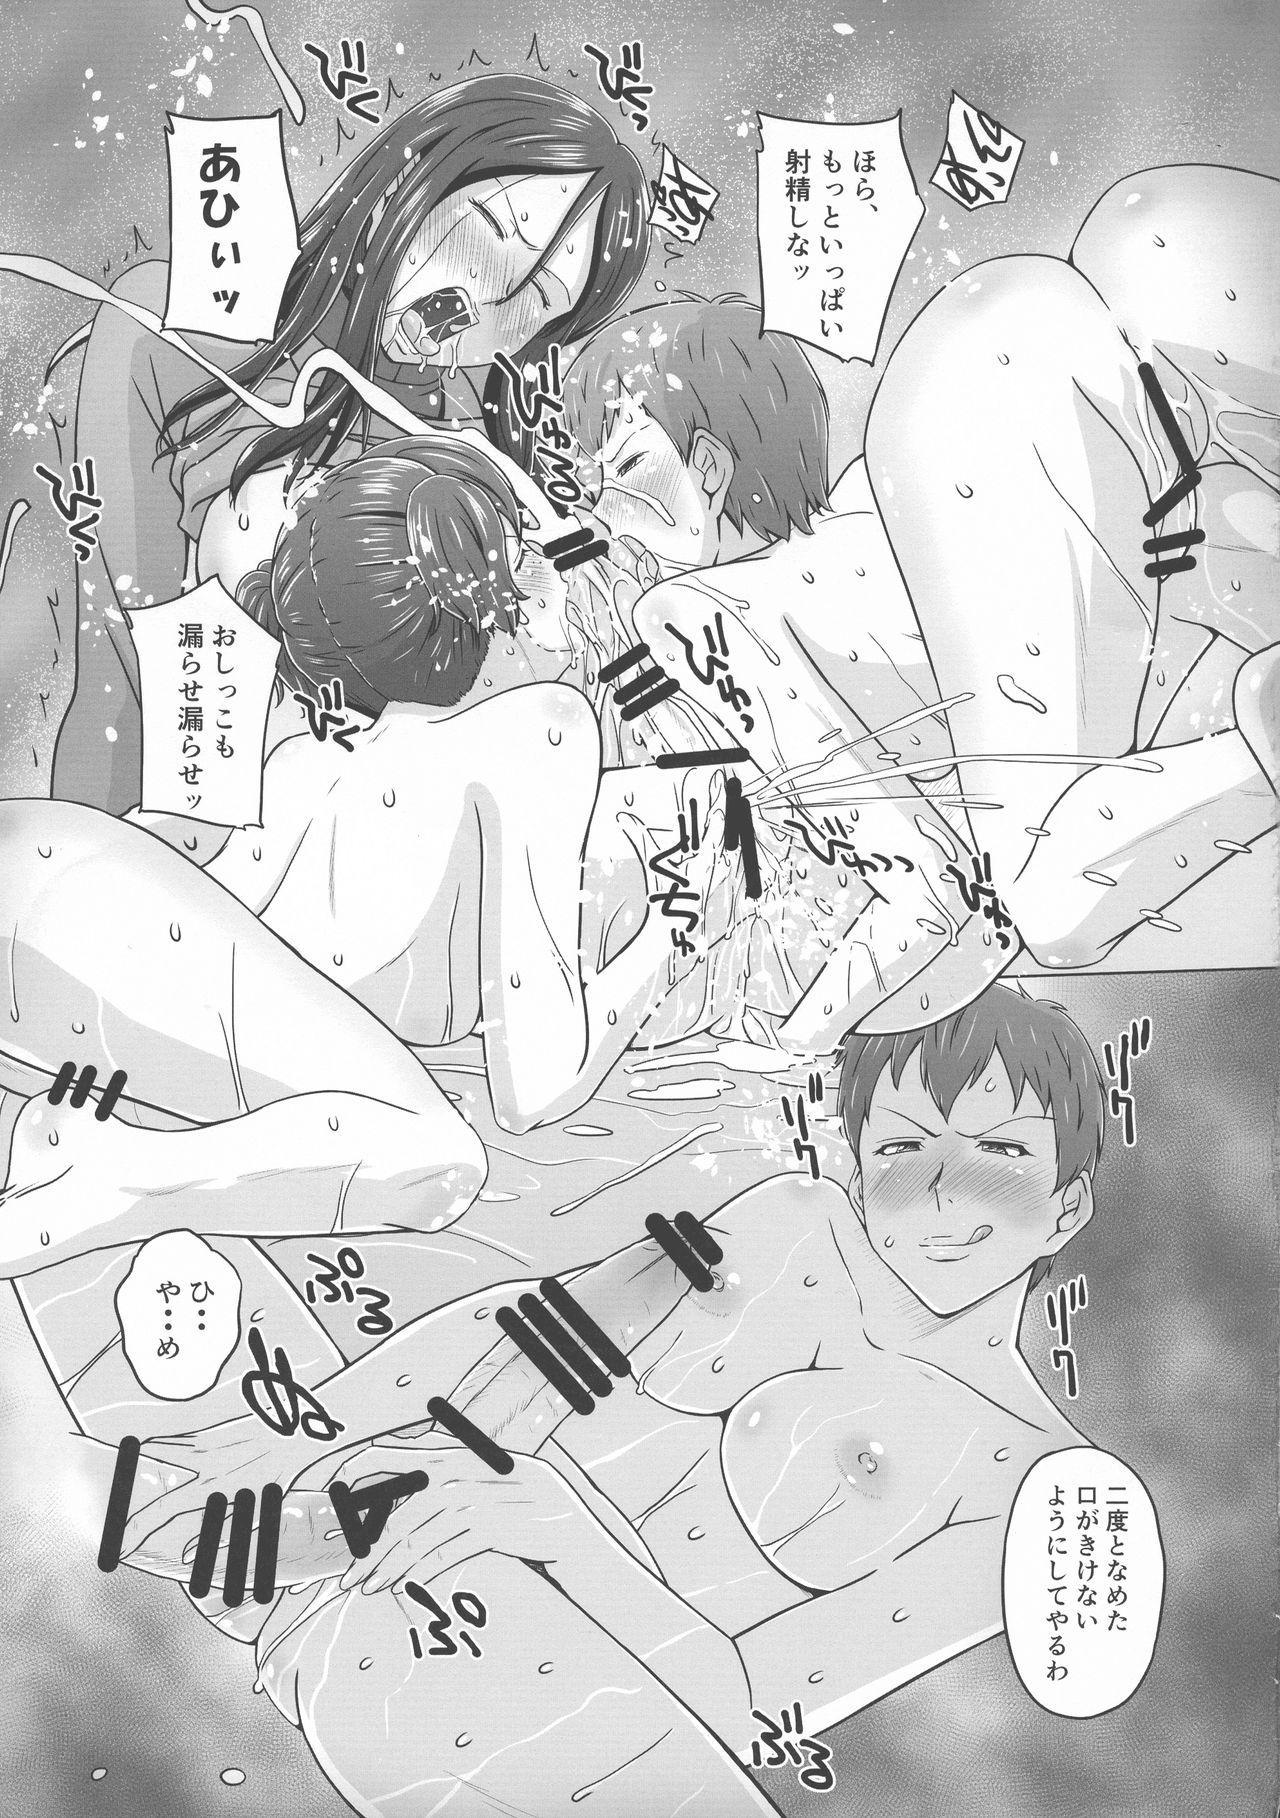 Ura Senshamichi Futanari Les Battle! Vol. 1 14